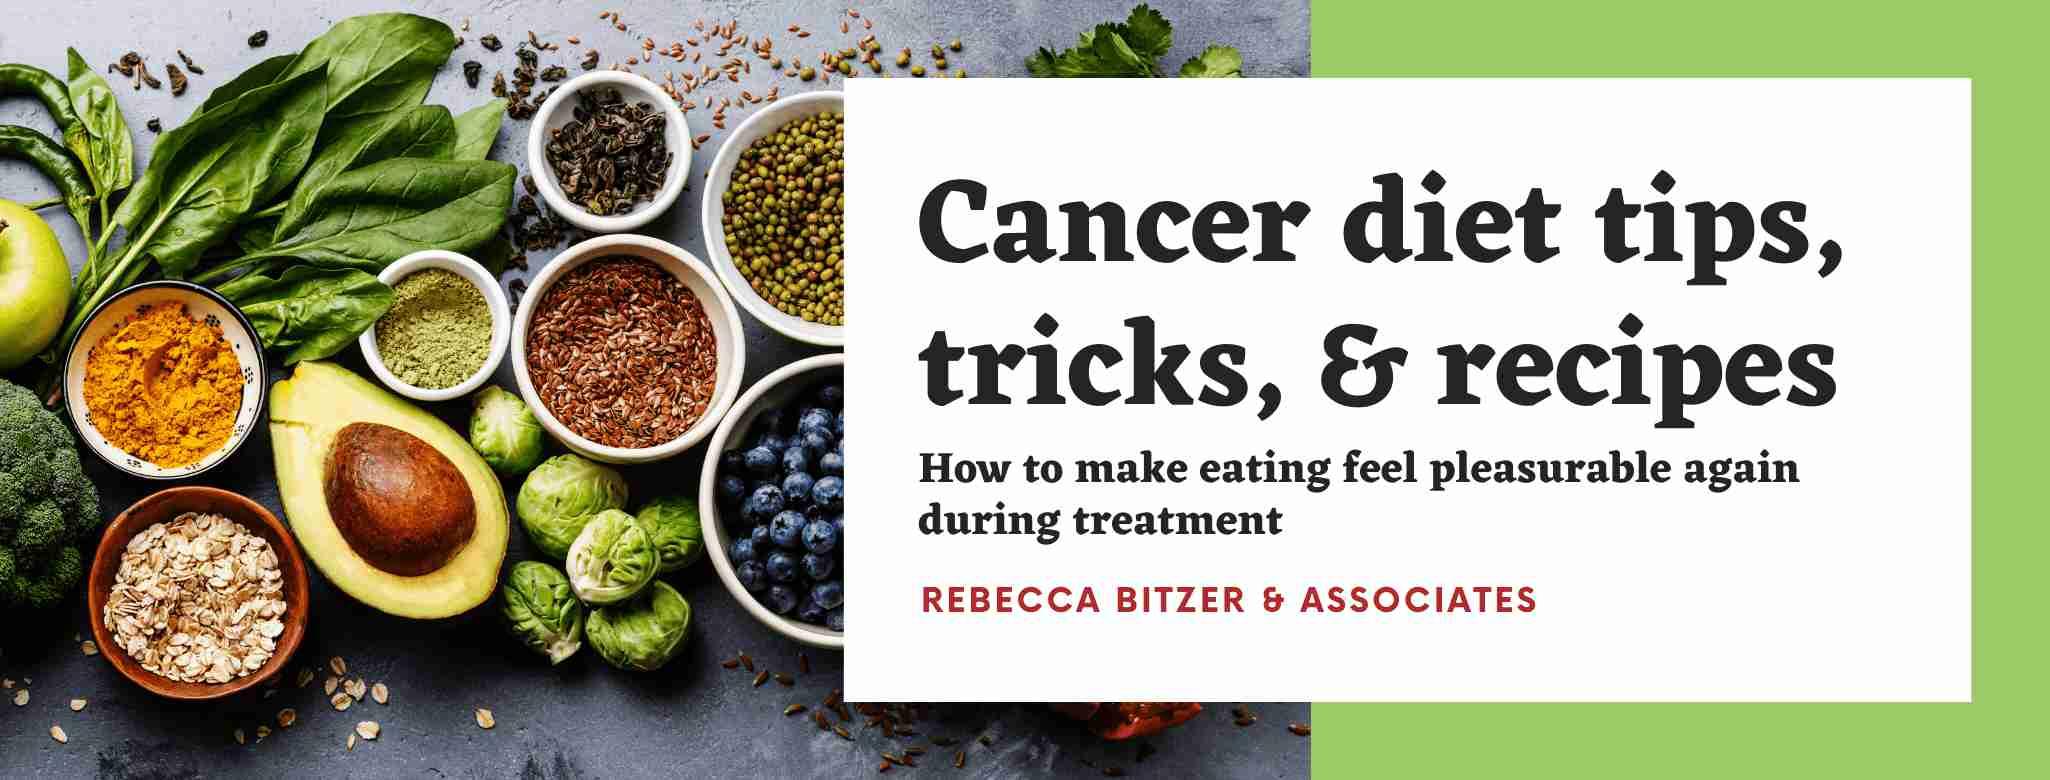 Cancer diet tips, tricks, & recipes